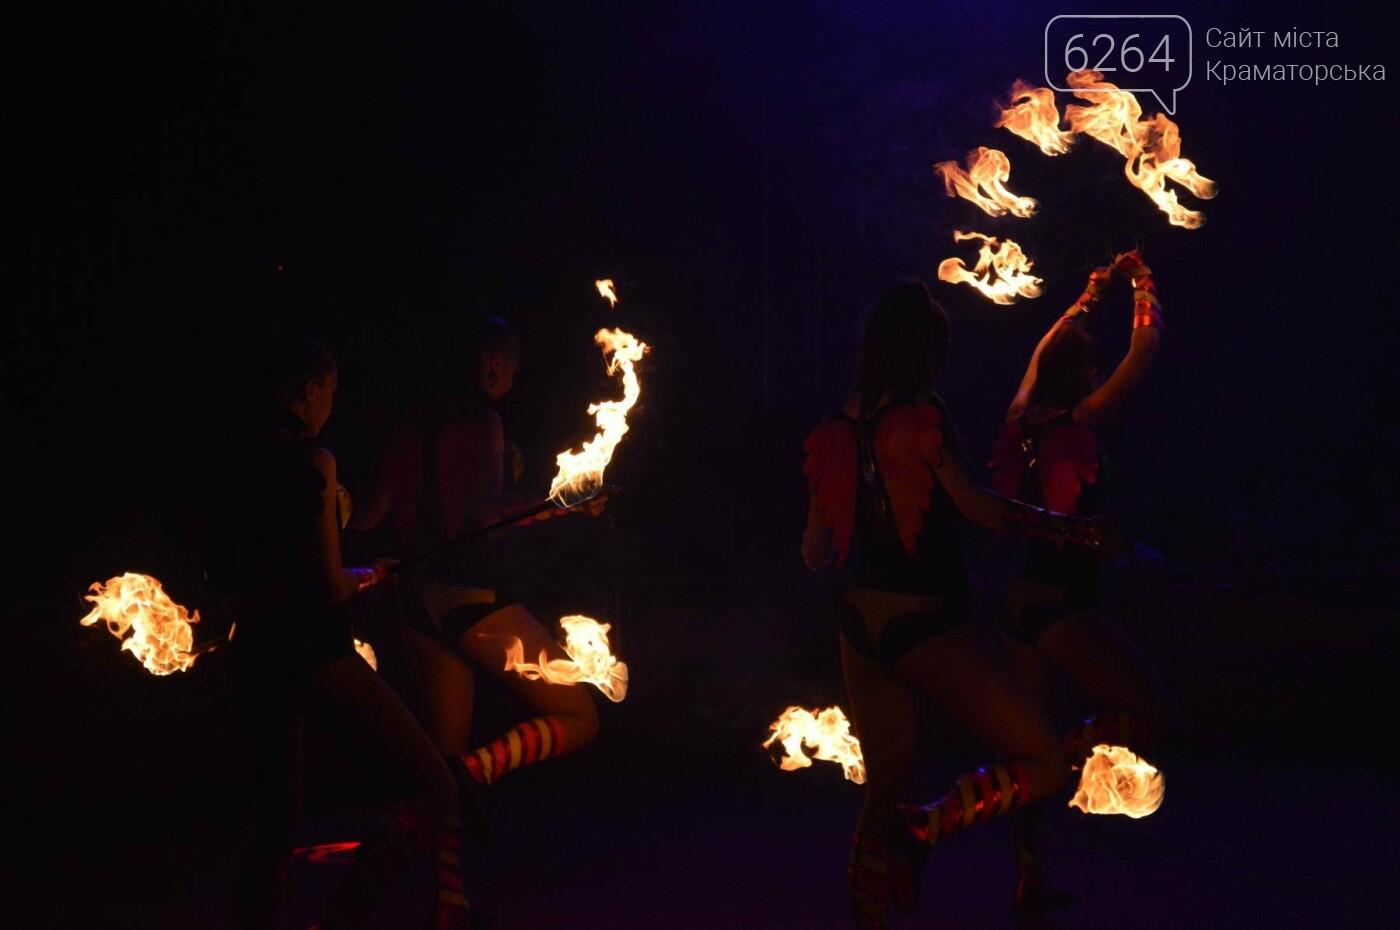 Новое шоу цирка «Кобзов» произвело фурор в Краматорске, фото-15